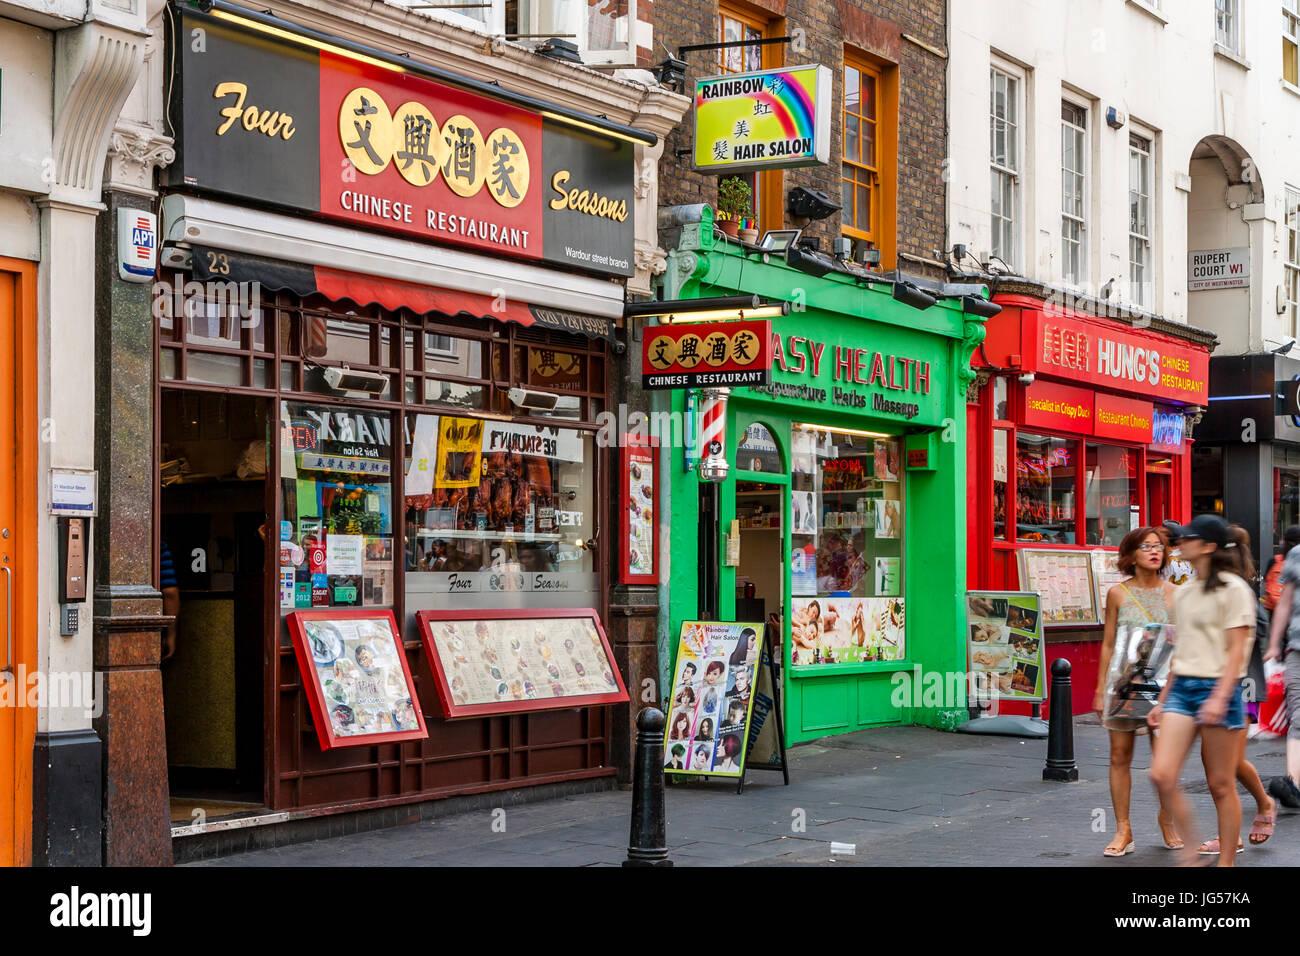 Chinese Restaurants and Shops On Wardour Street, Chinatown, London, UK - Stock Image